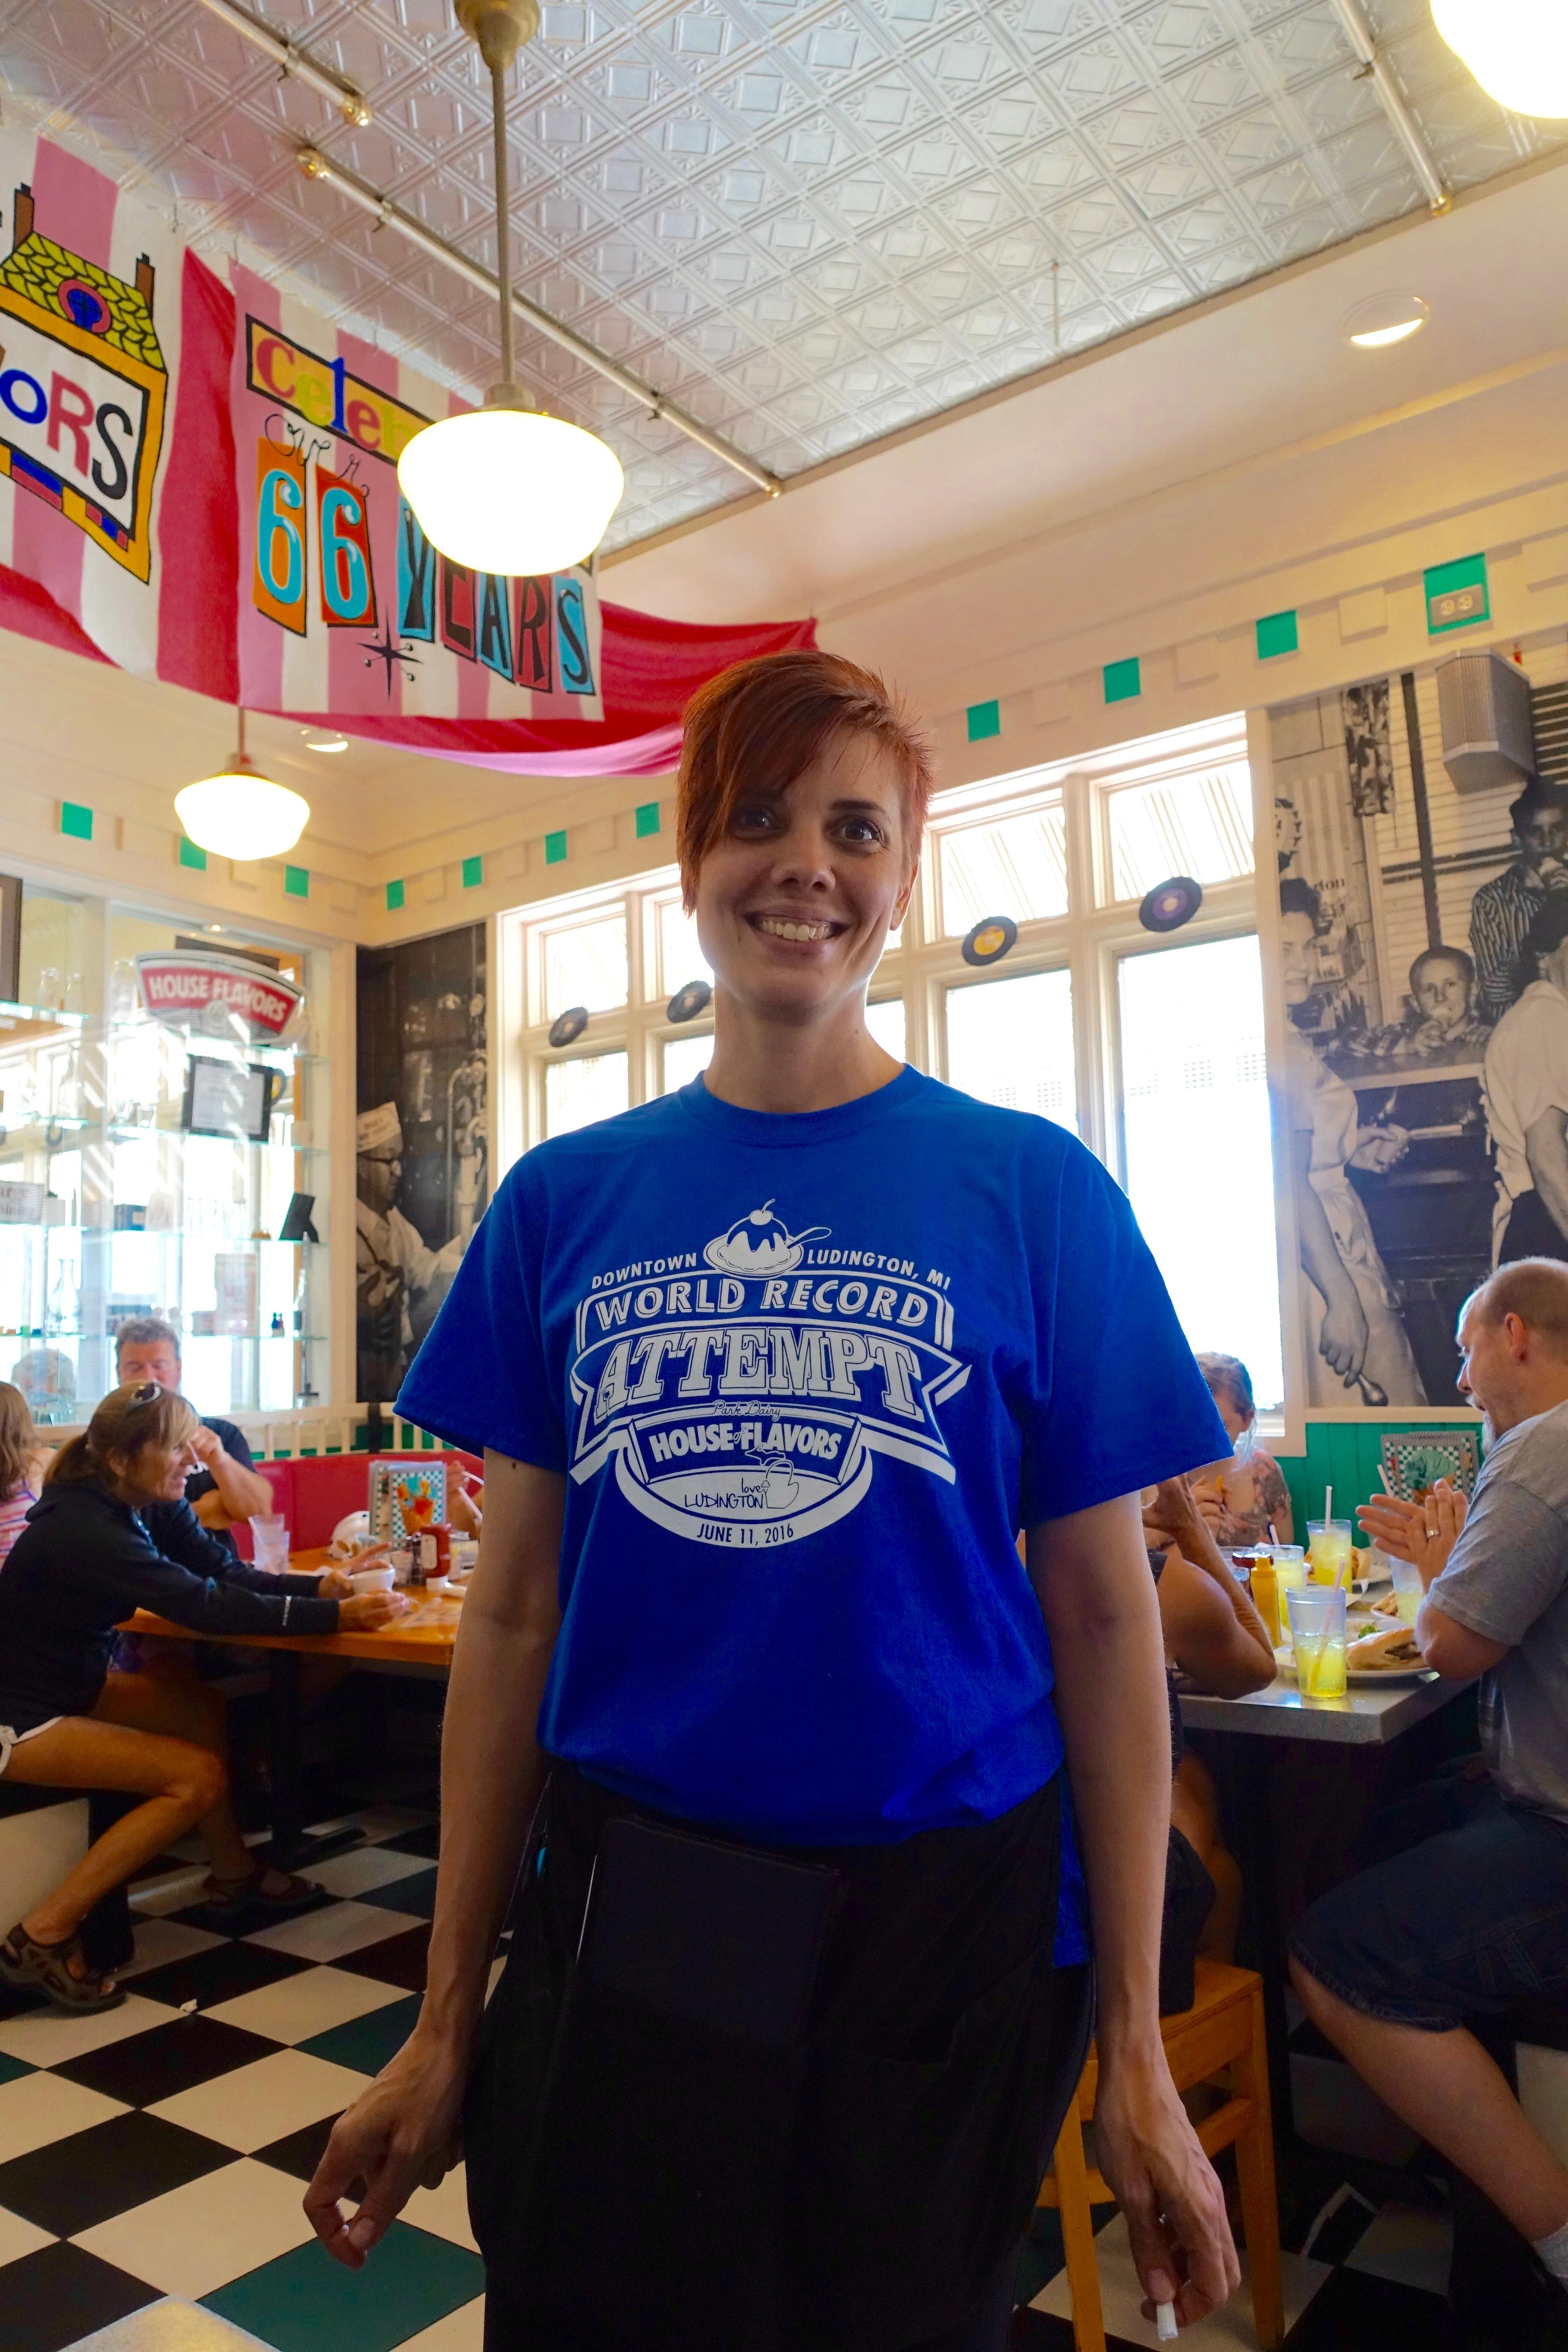 Waitress wearing tee shirt at Ludington's World's Largest Sundae Attempt